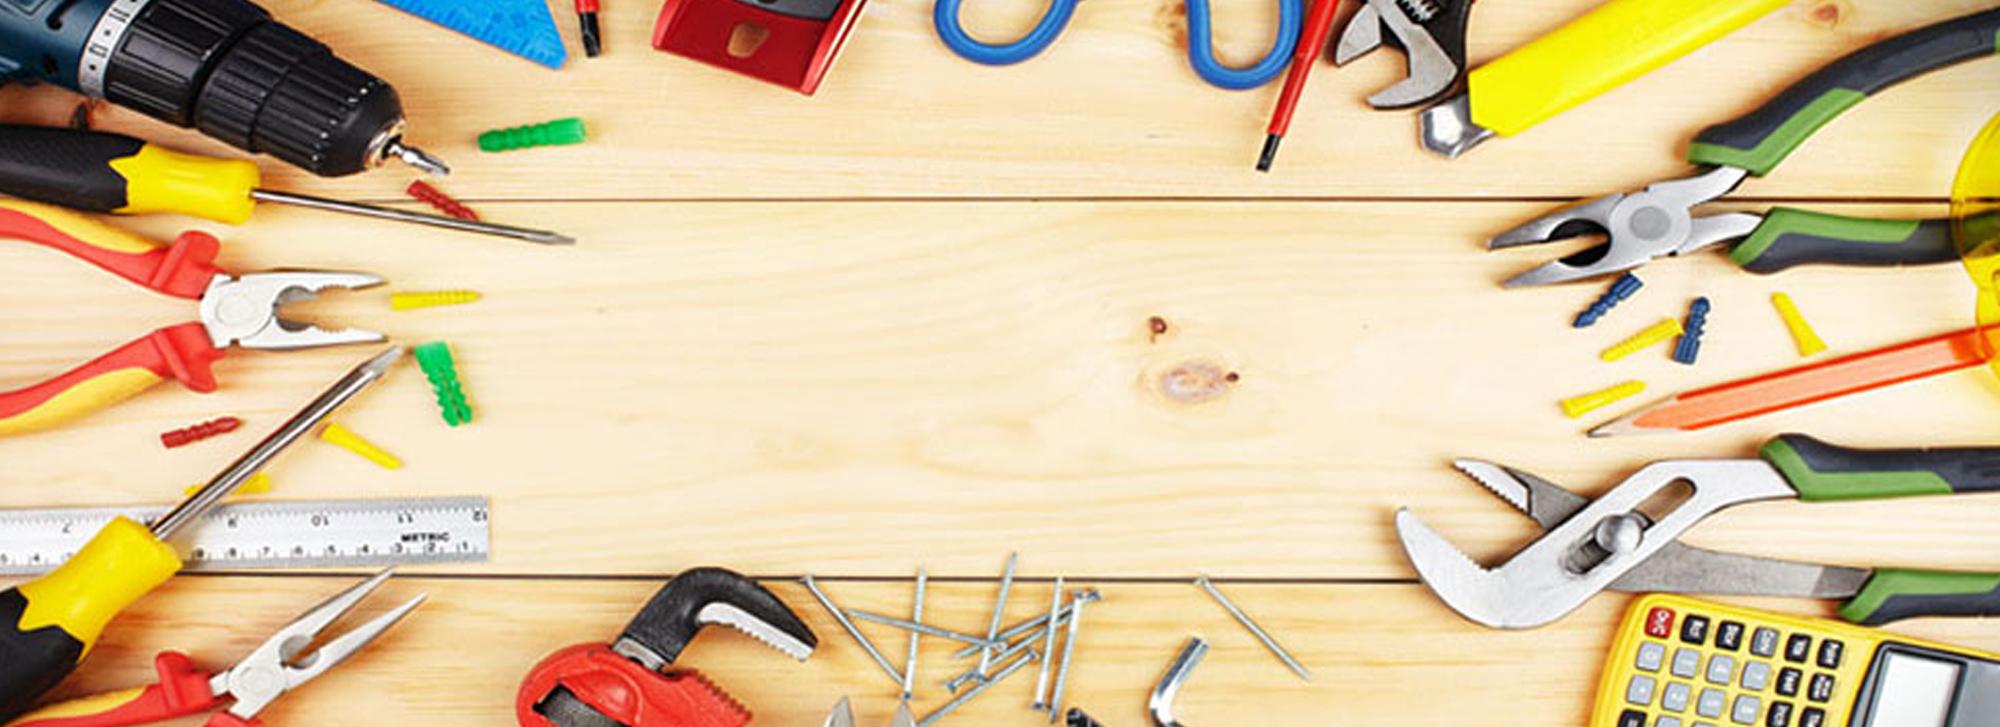 Building Renovation Supplies